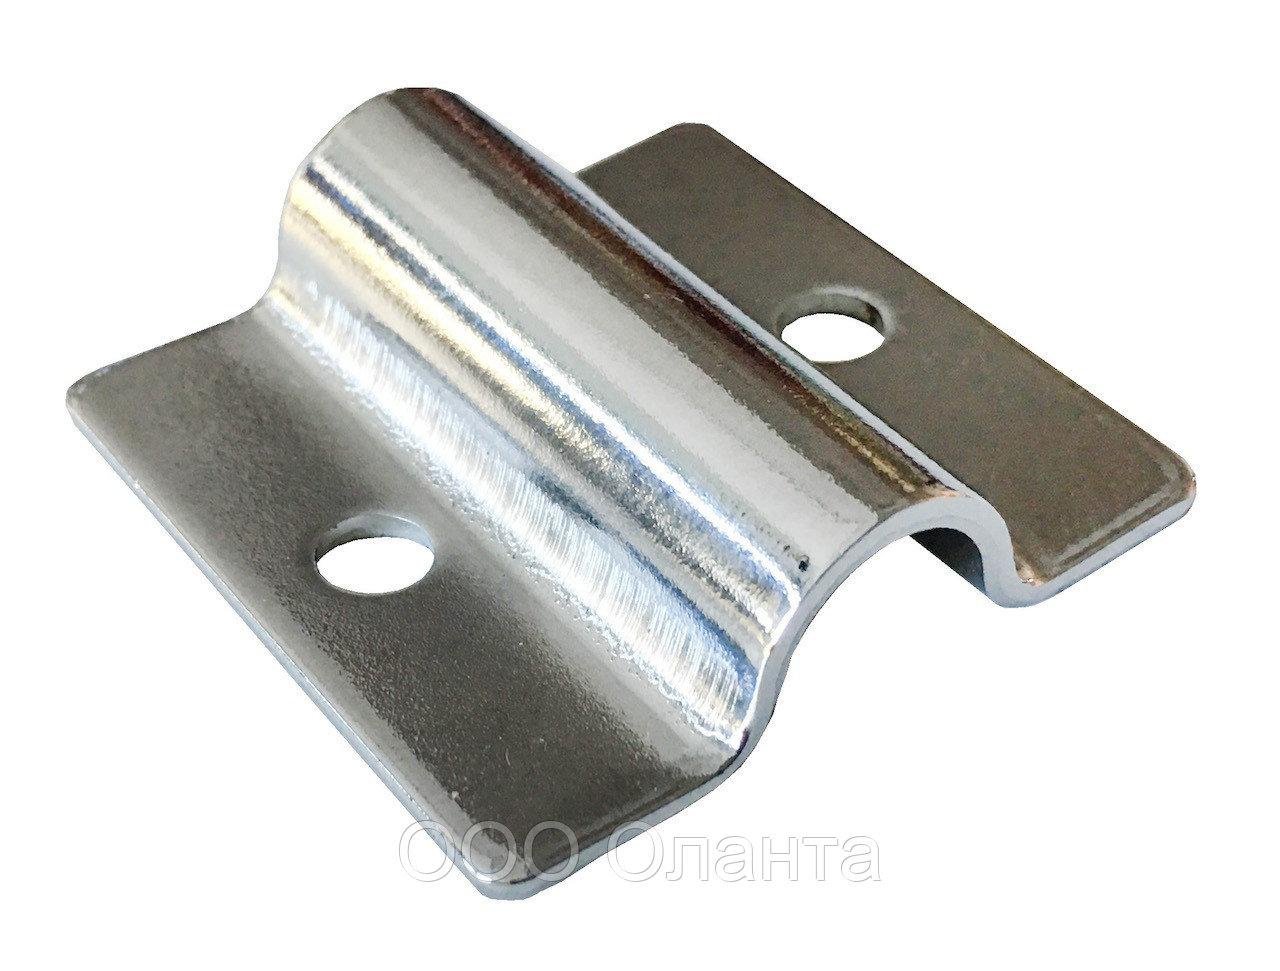 Крепеж сетка-потолок хром арт. FG608